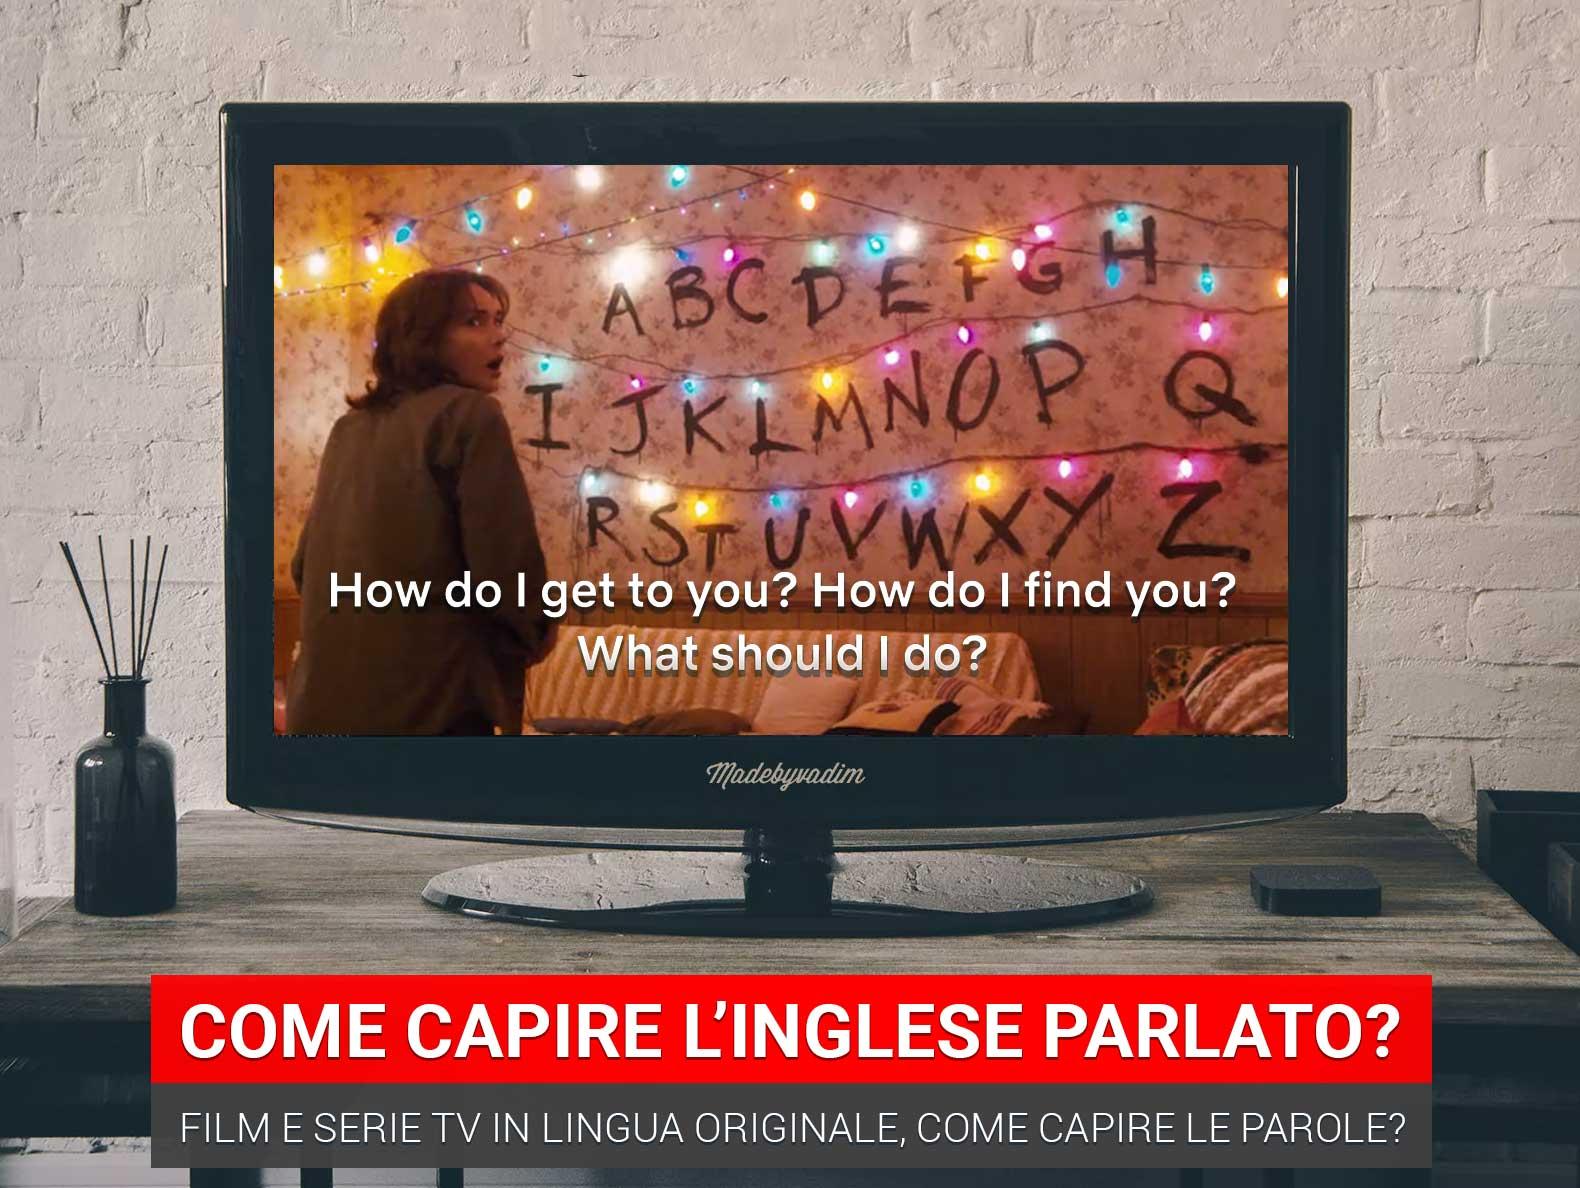 capire-inglese-parlato-serie-tv-film